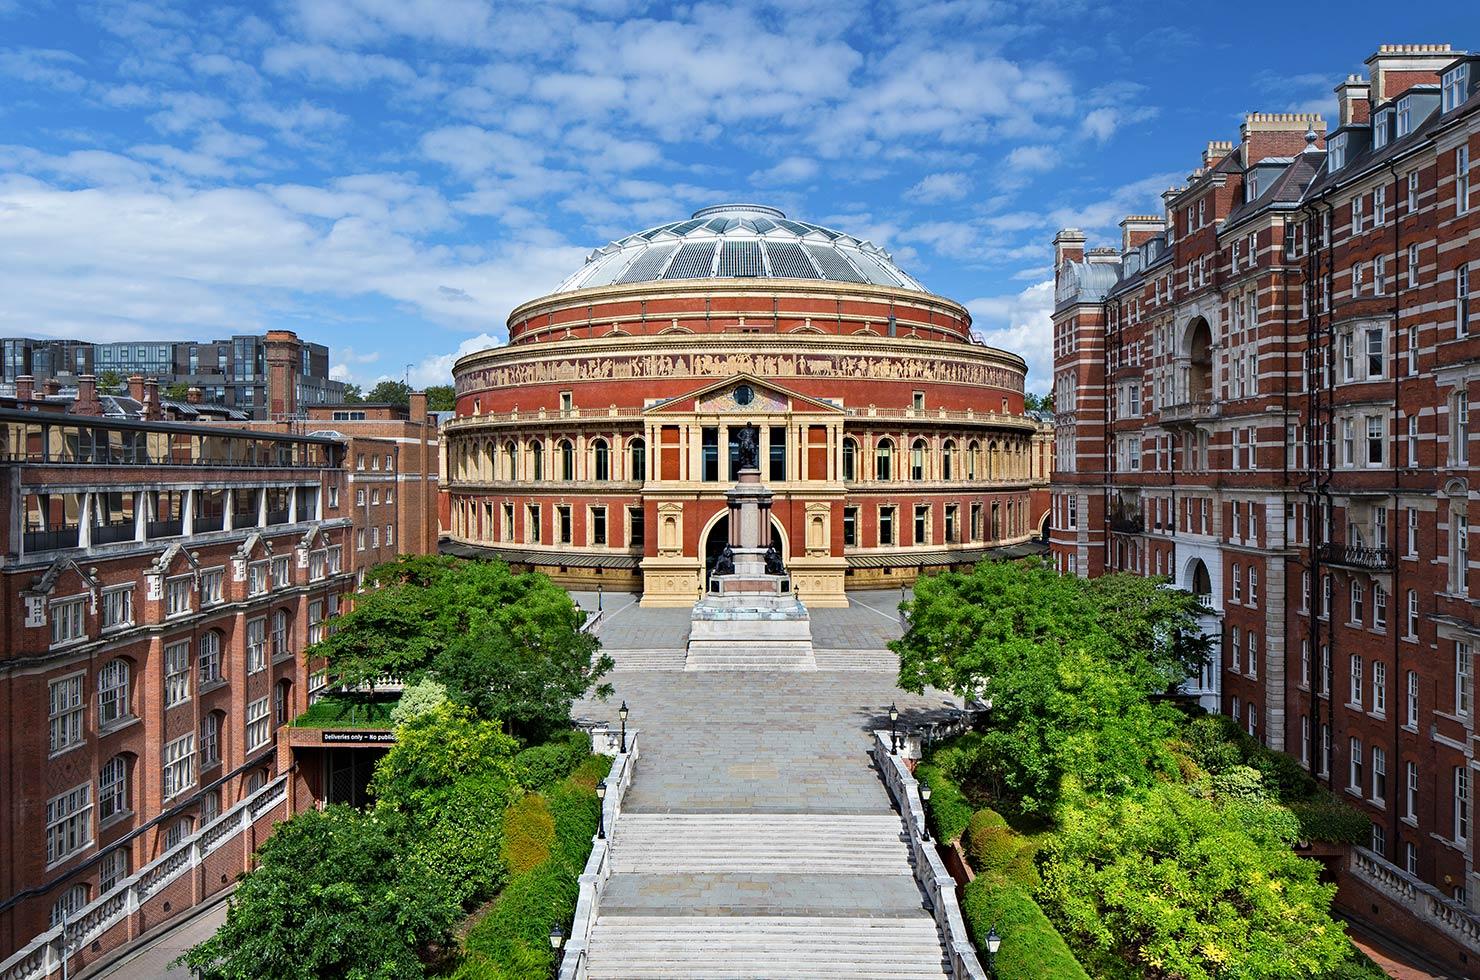 Royal Albert Hallの正面